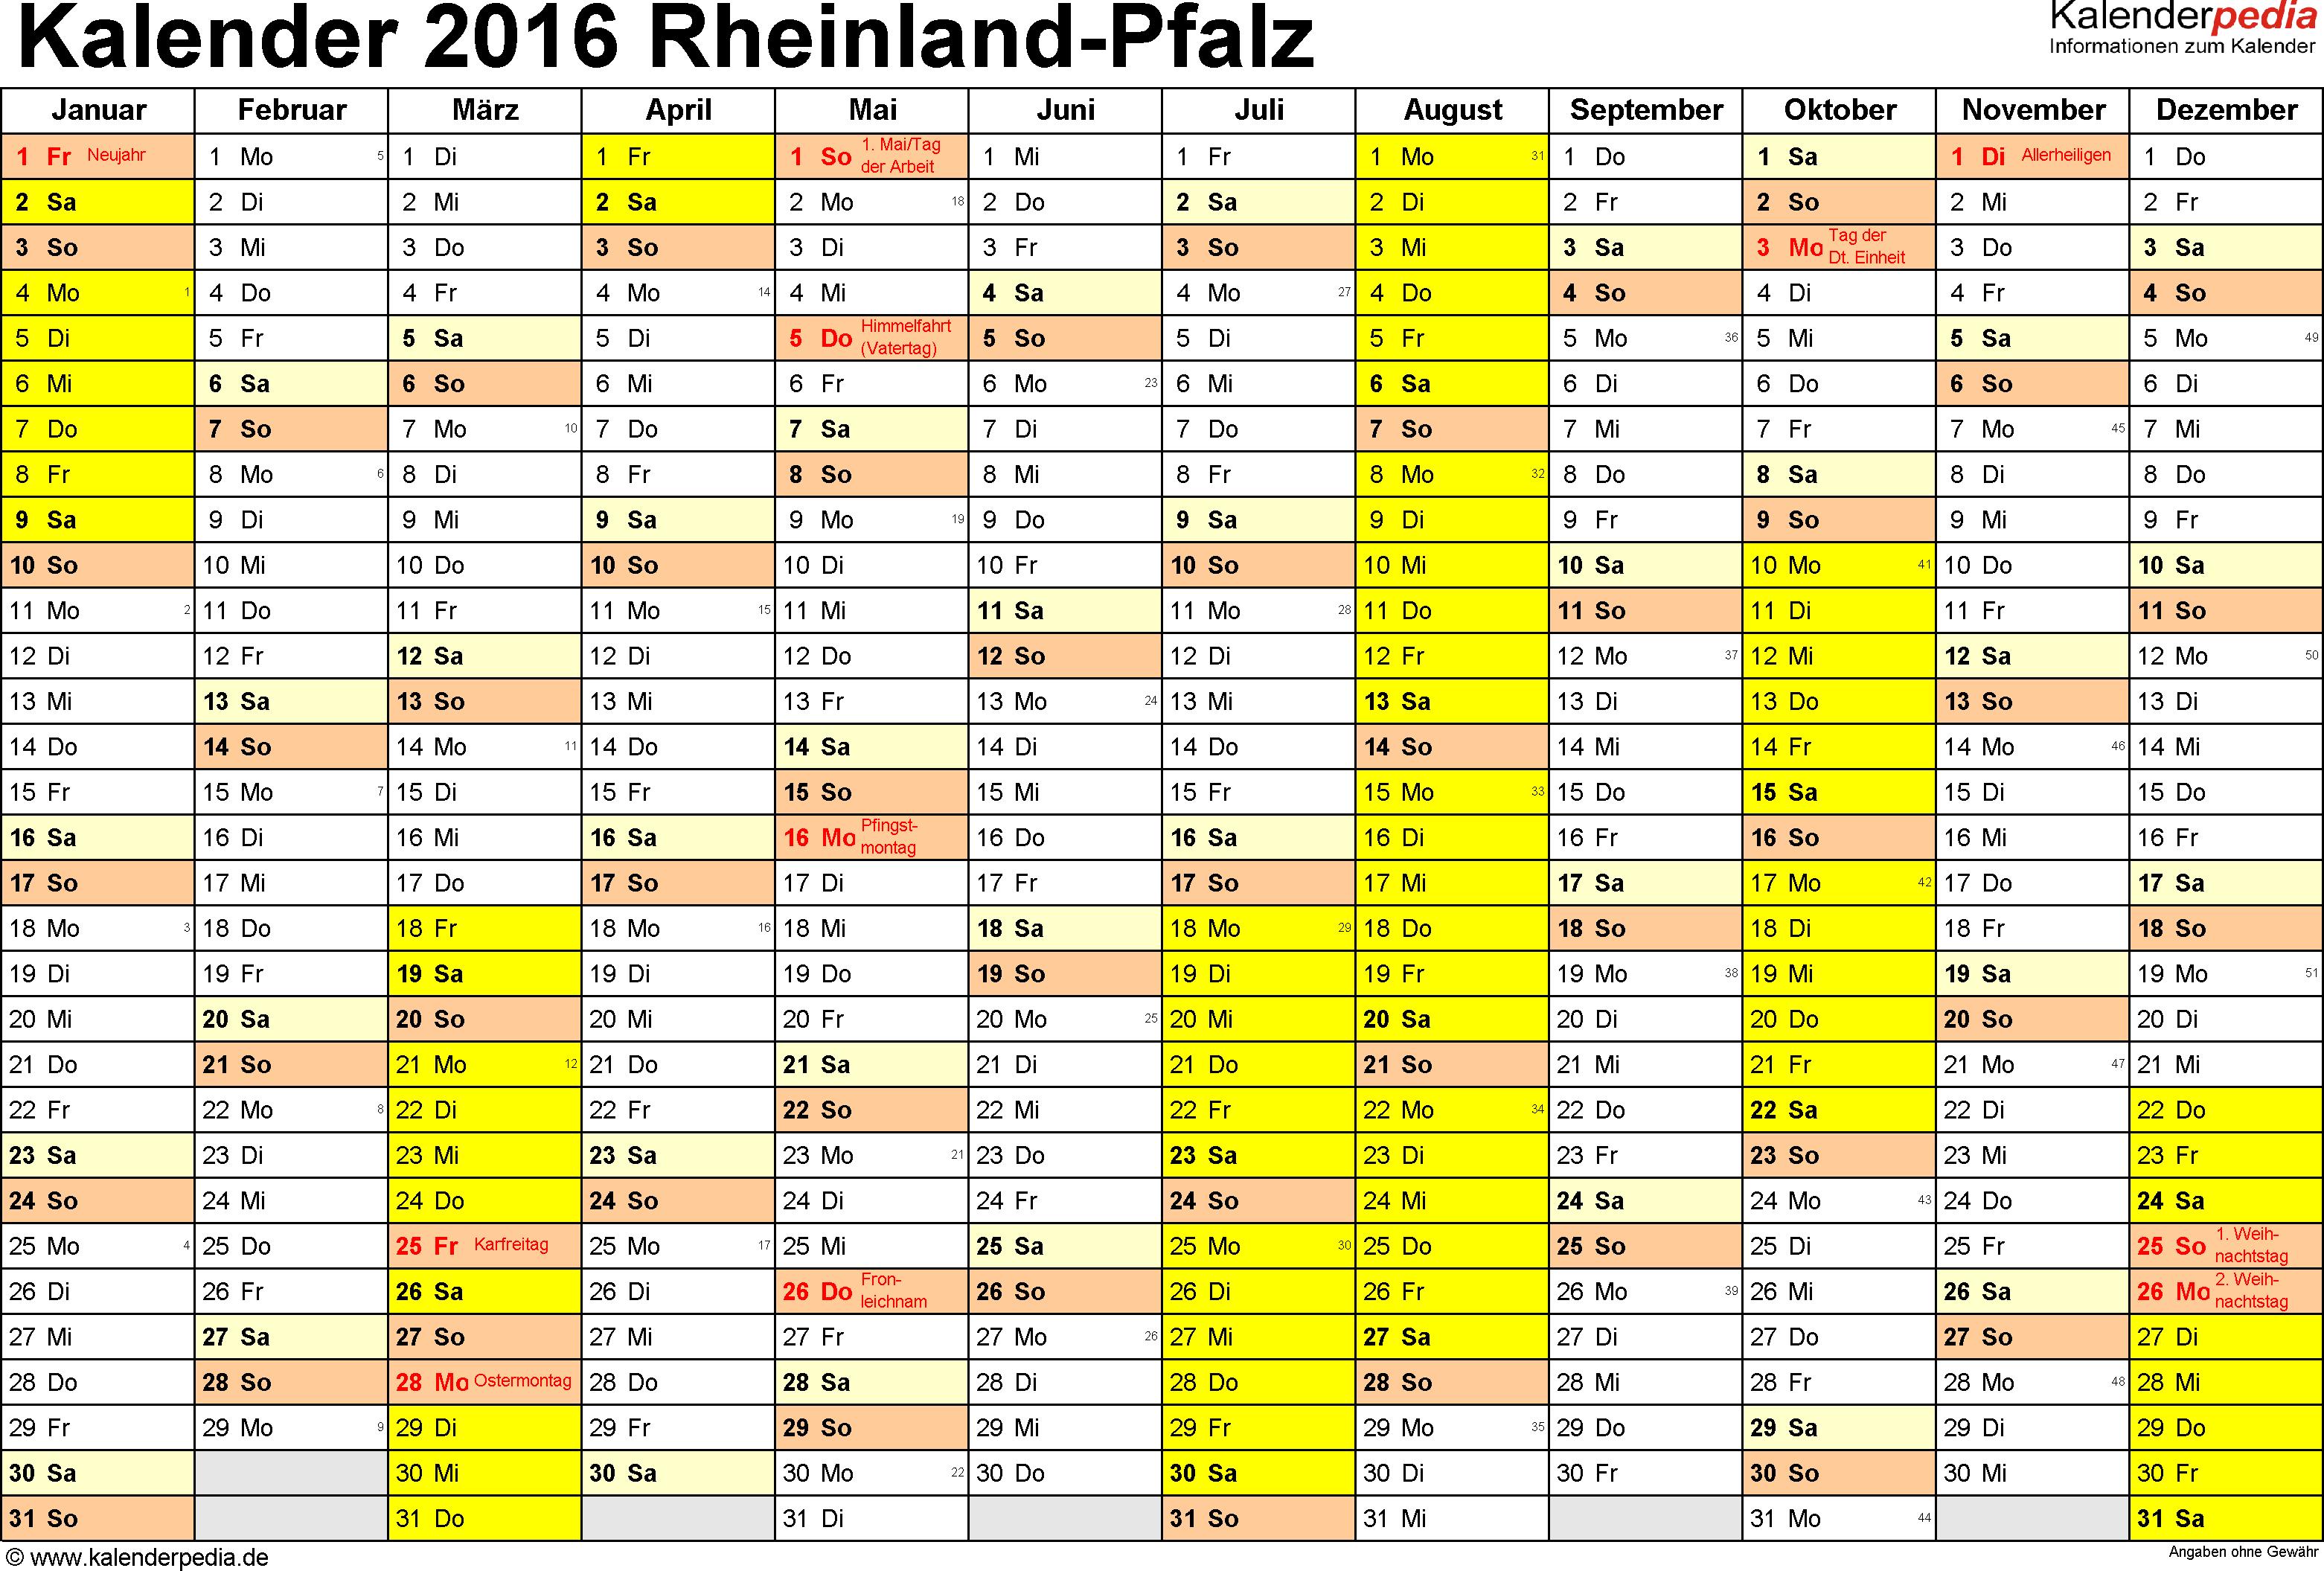 Kalender 2016 Rheinland-Pfalz